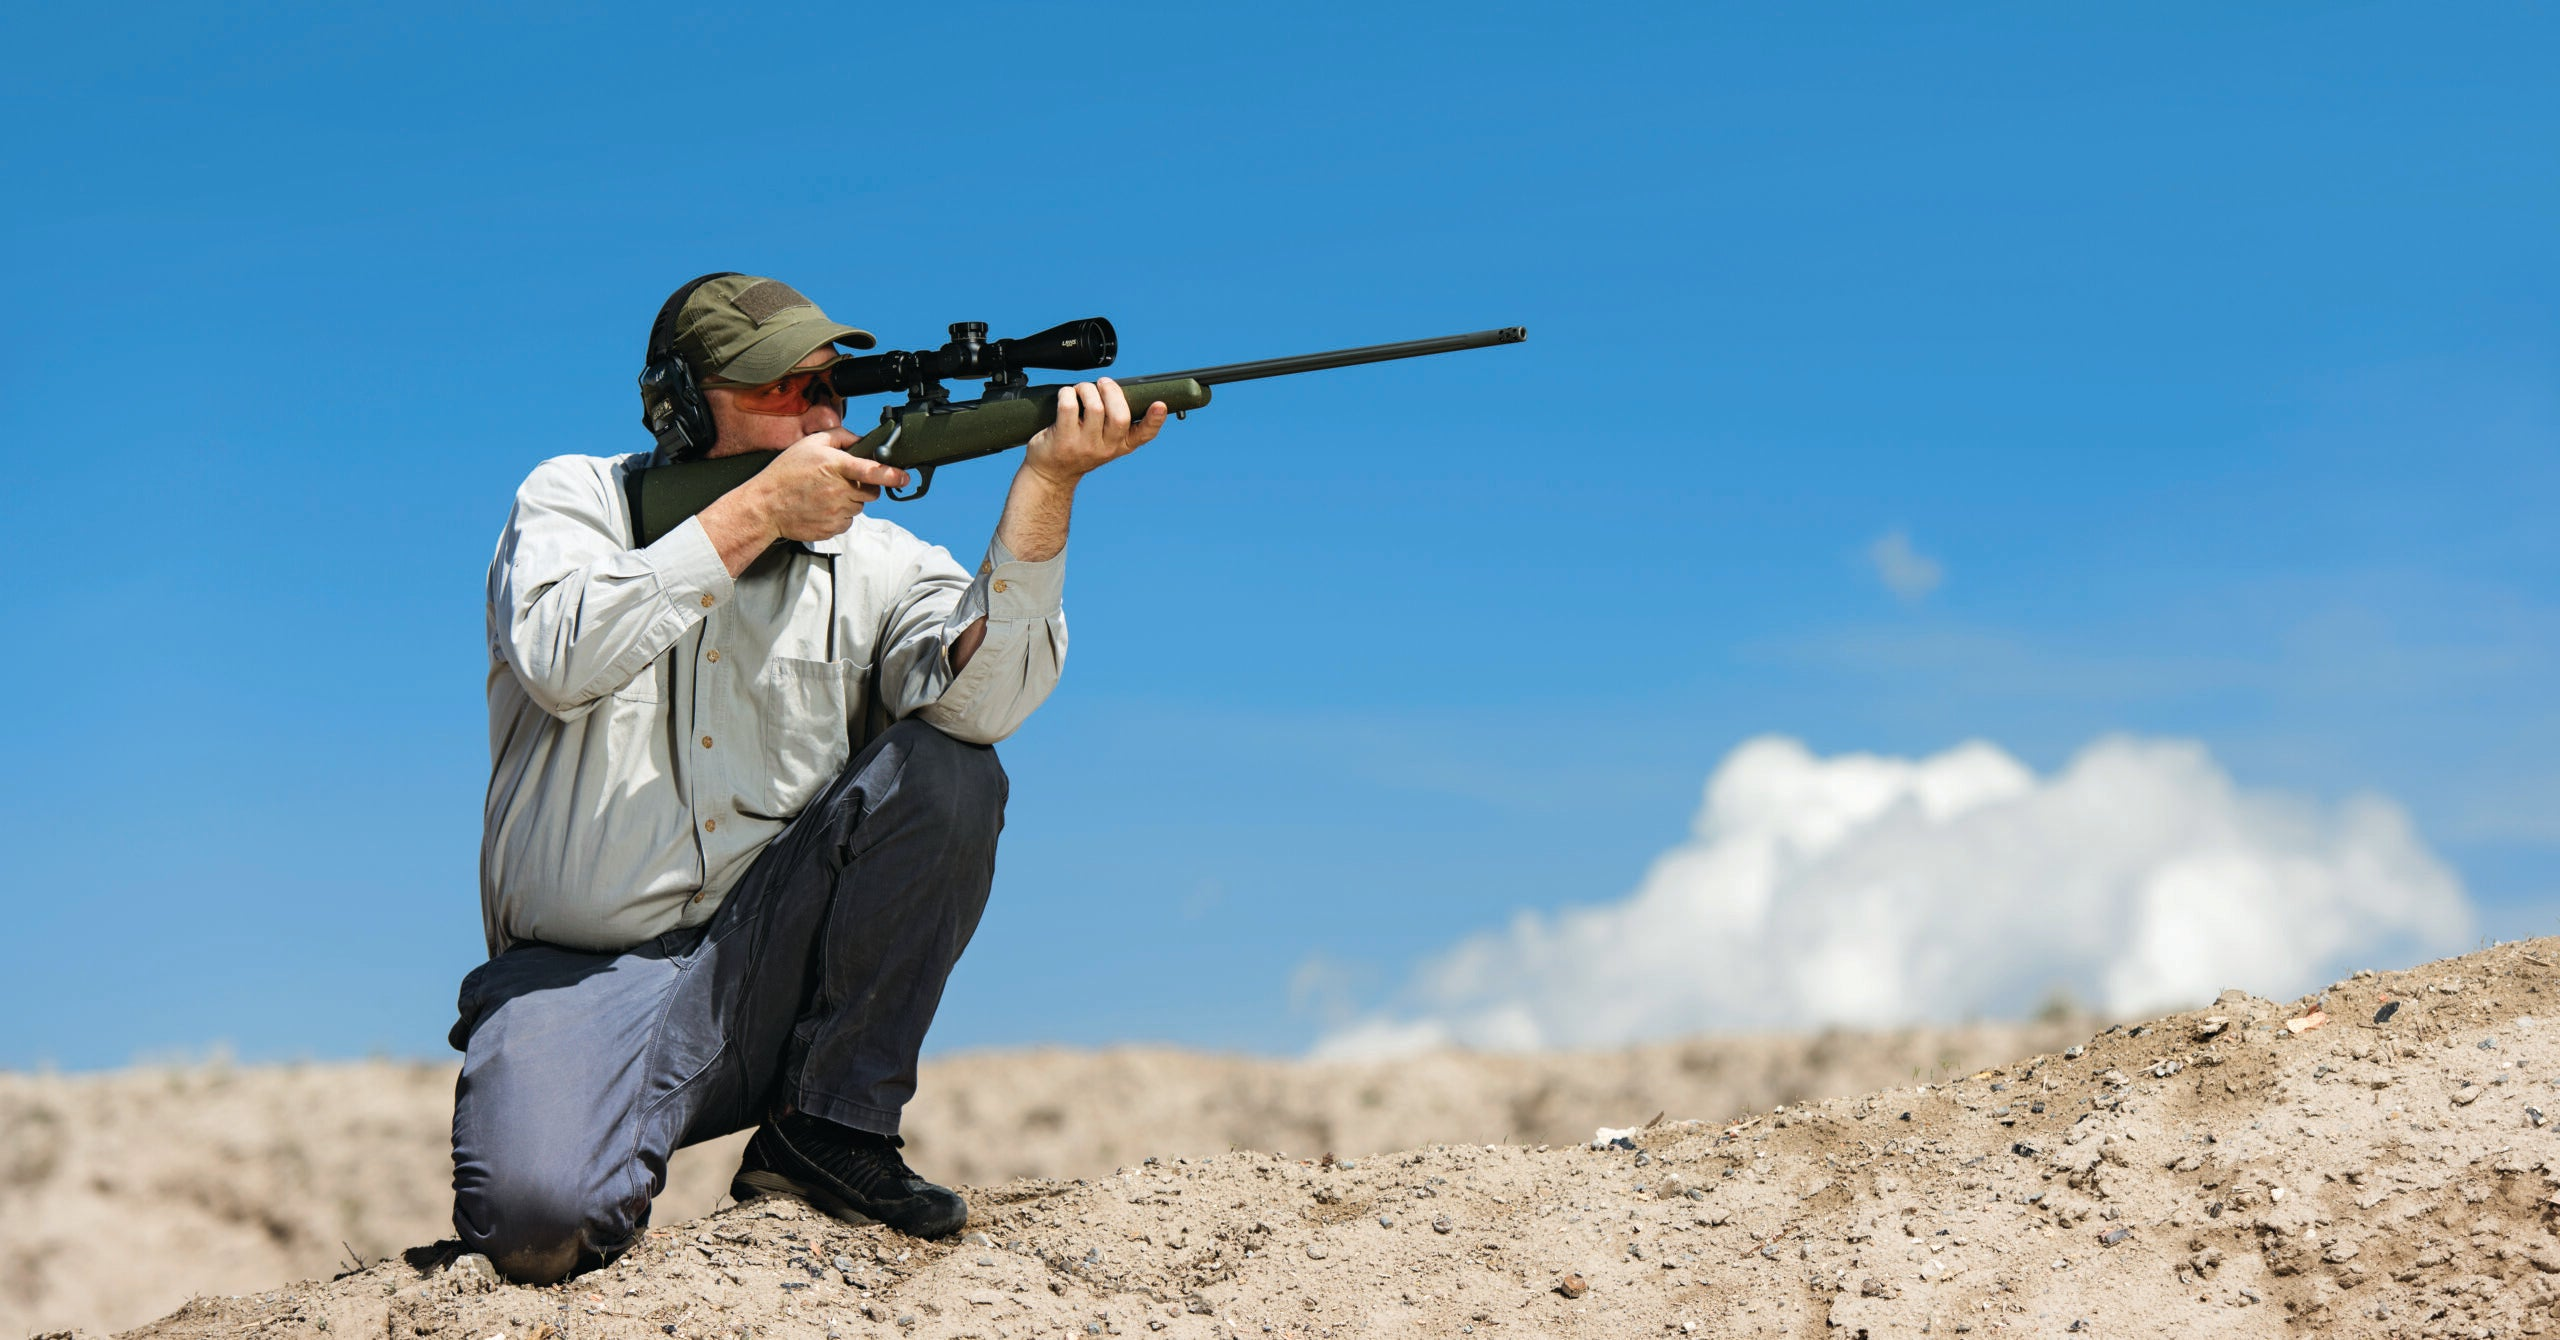 Optics Test: Three Scopes for Long-Range Hunting